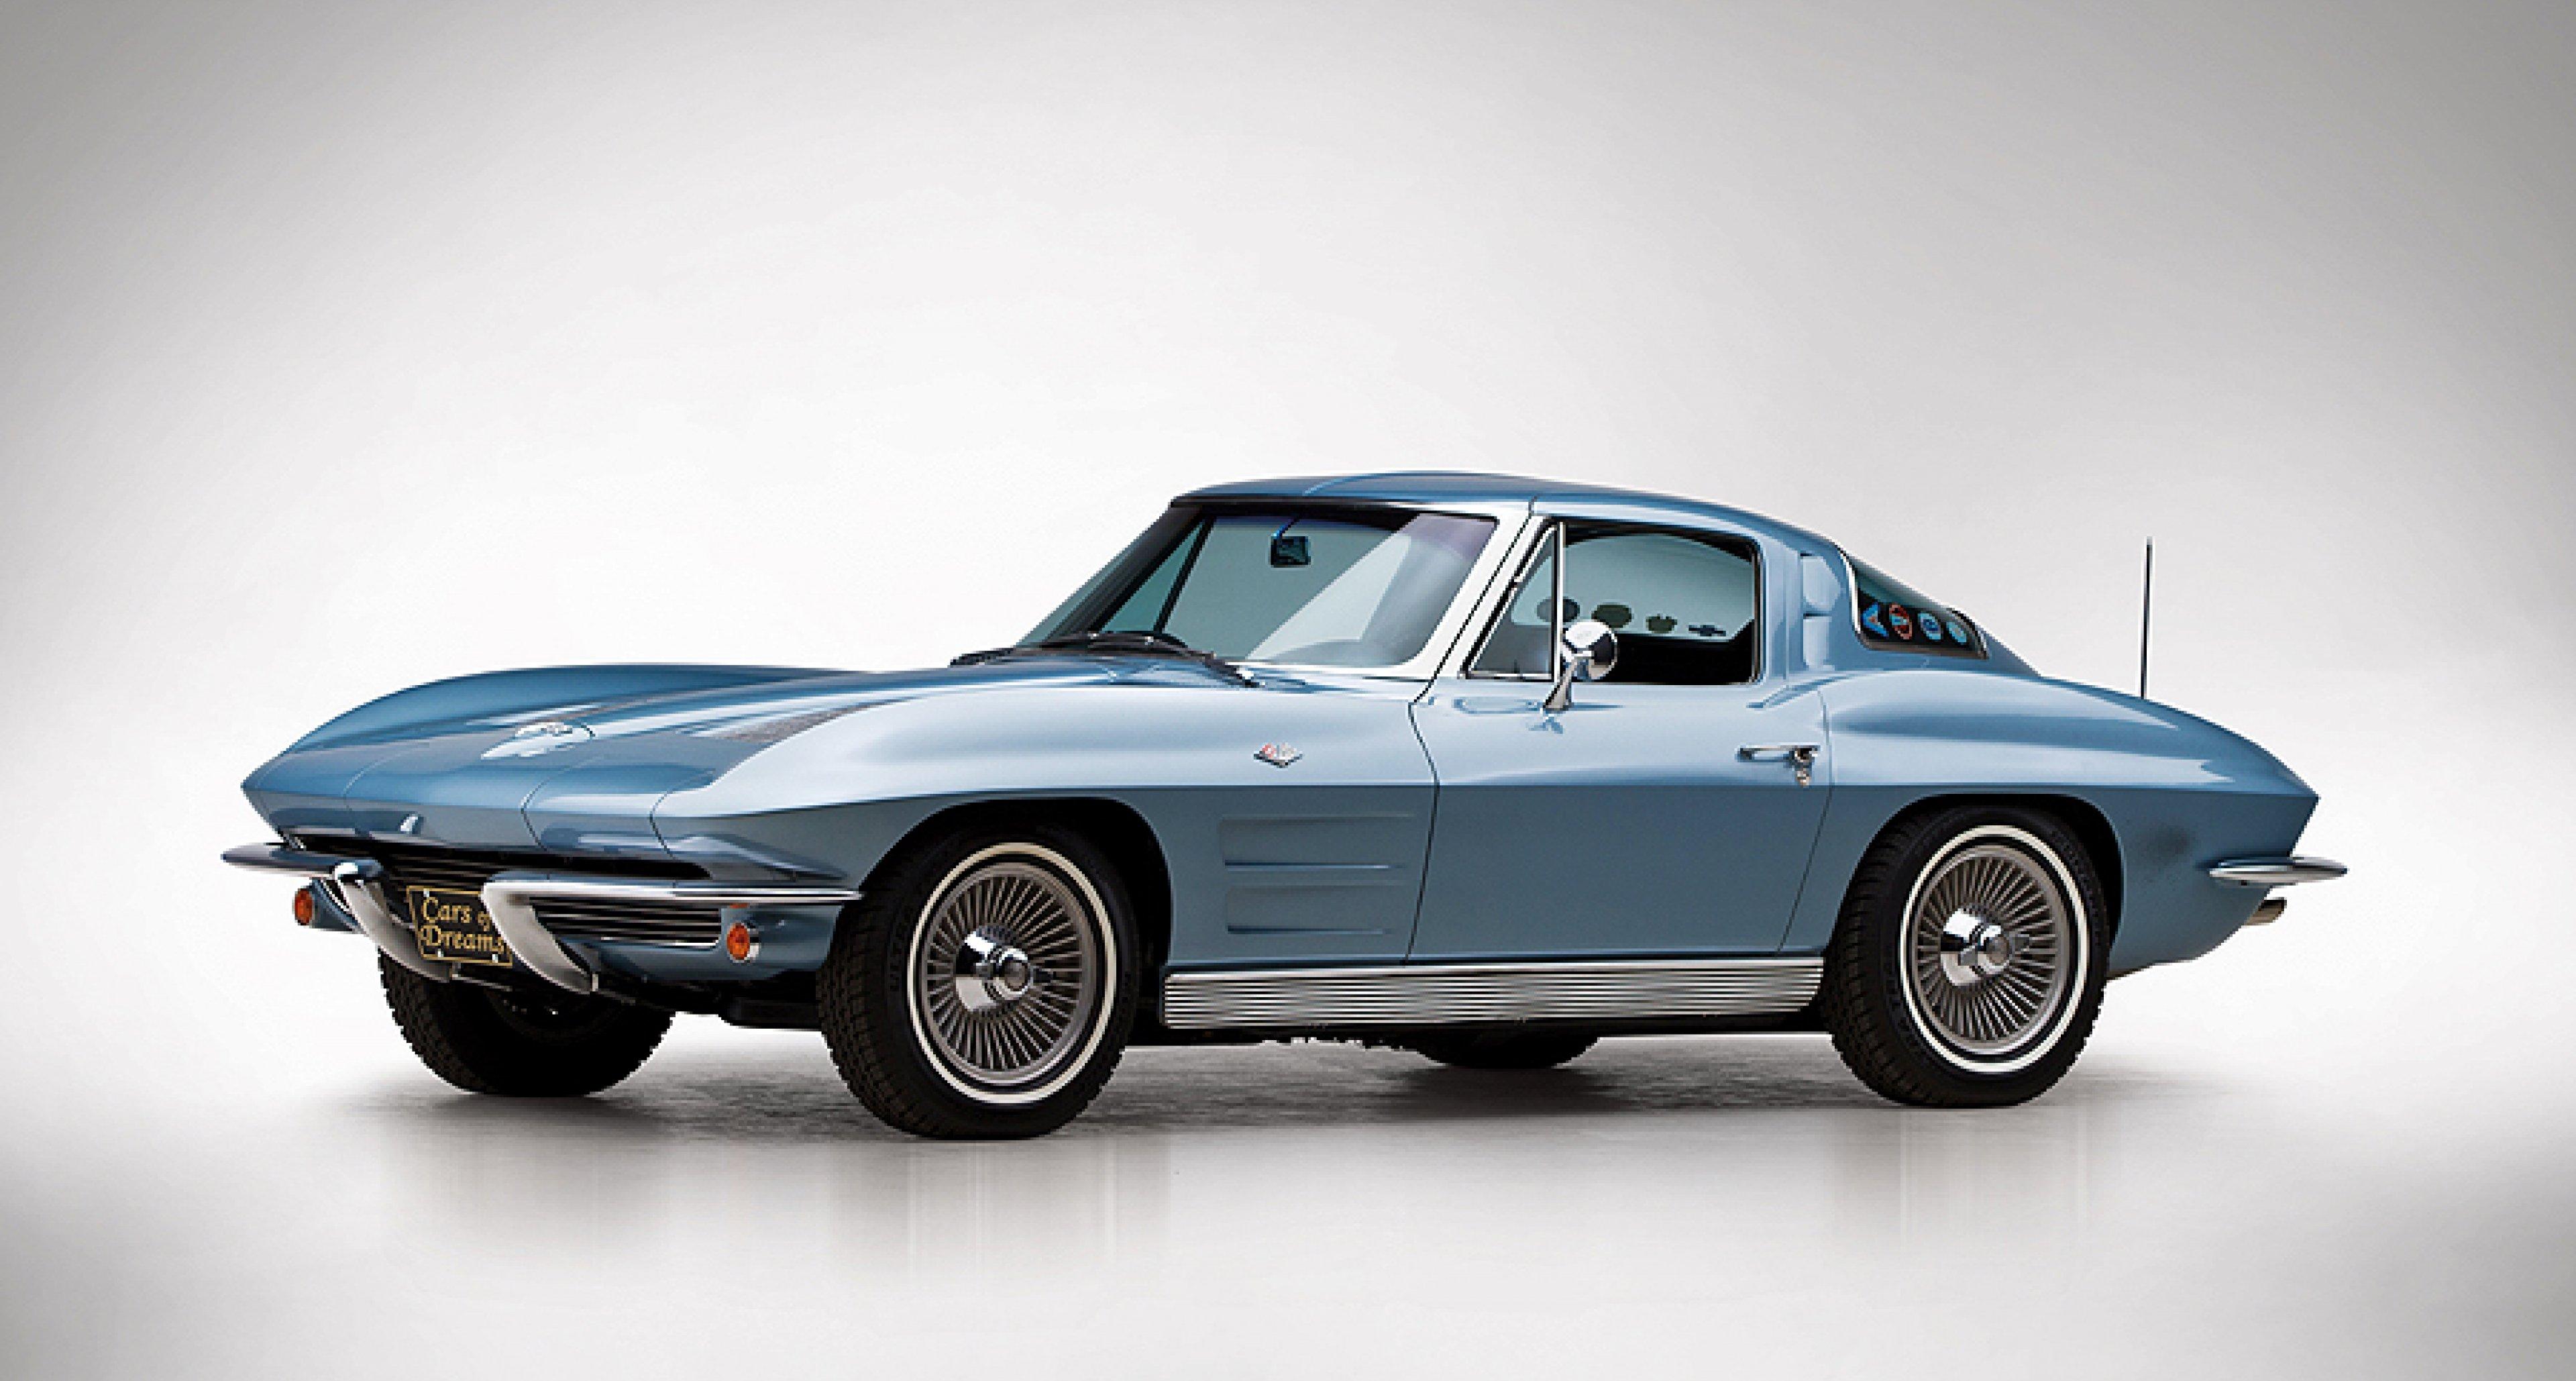 Chevrolet corvette sting ray 39 split window 39 coup for 1967 corvette stingray split window